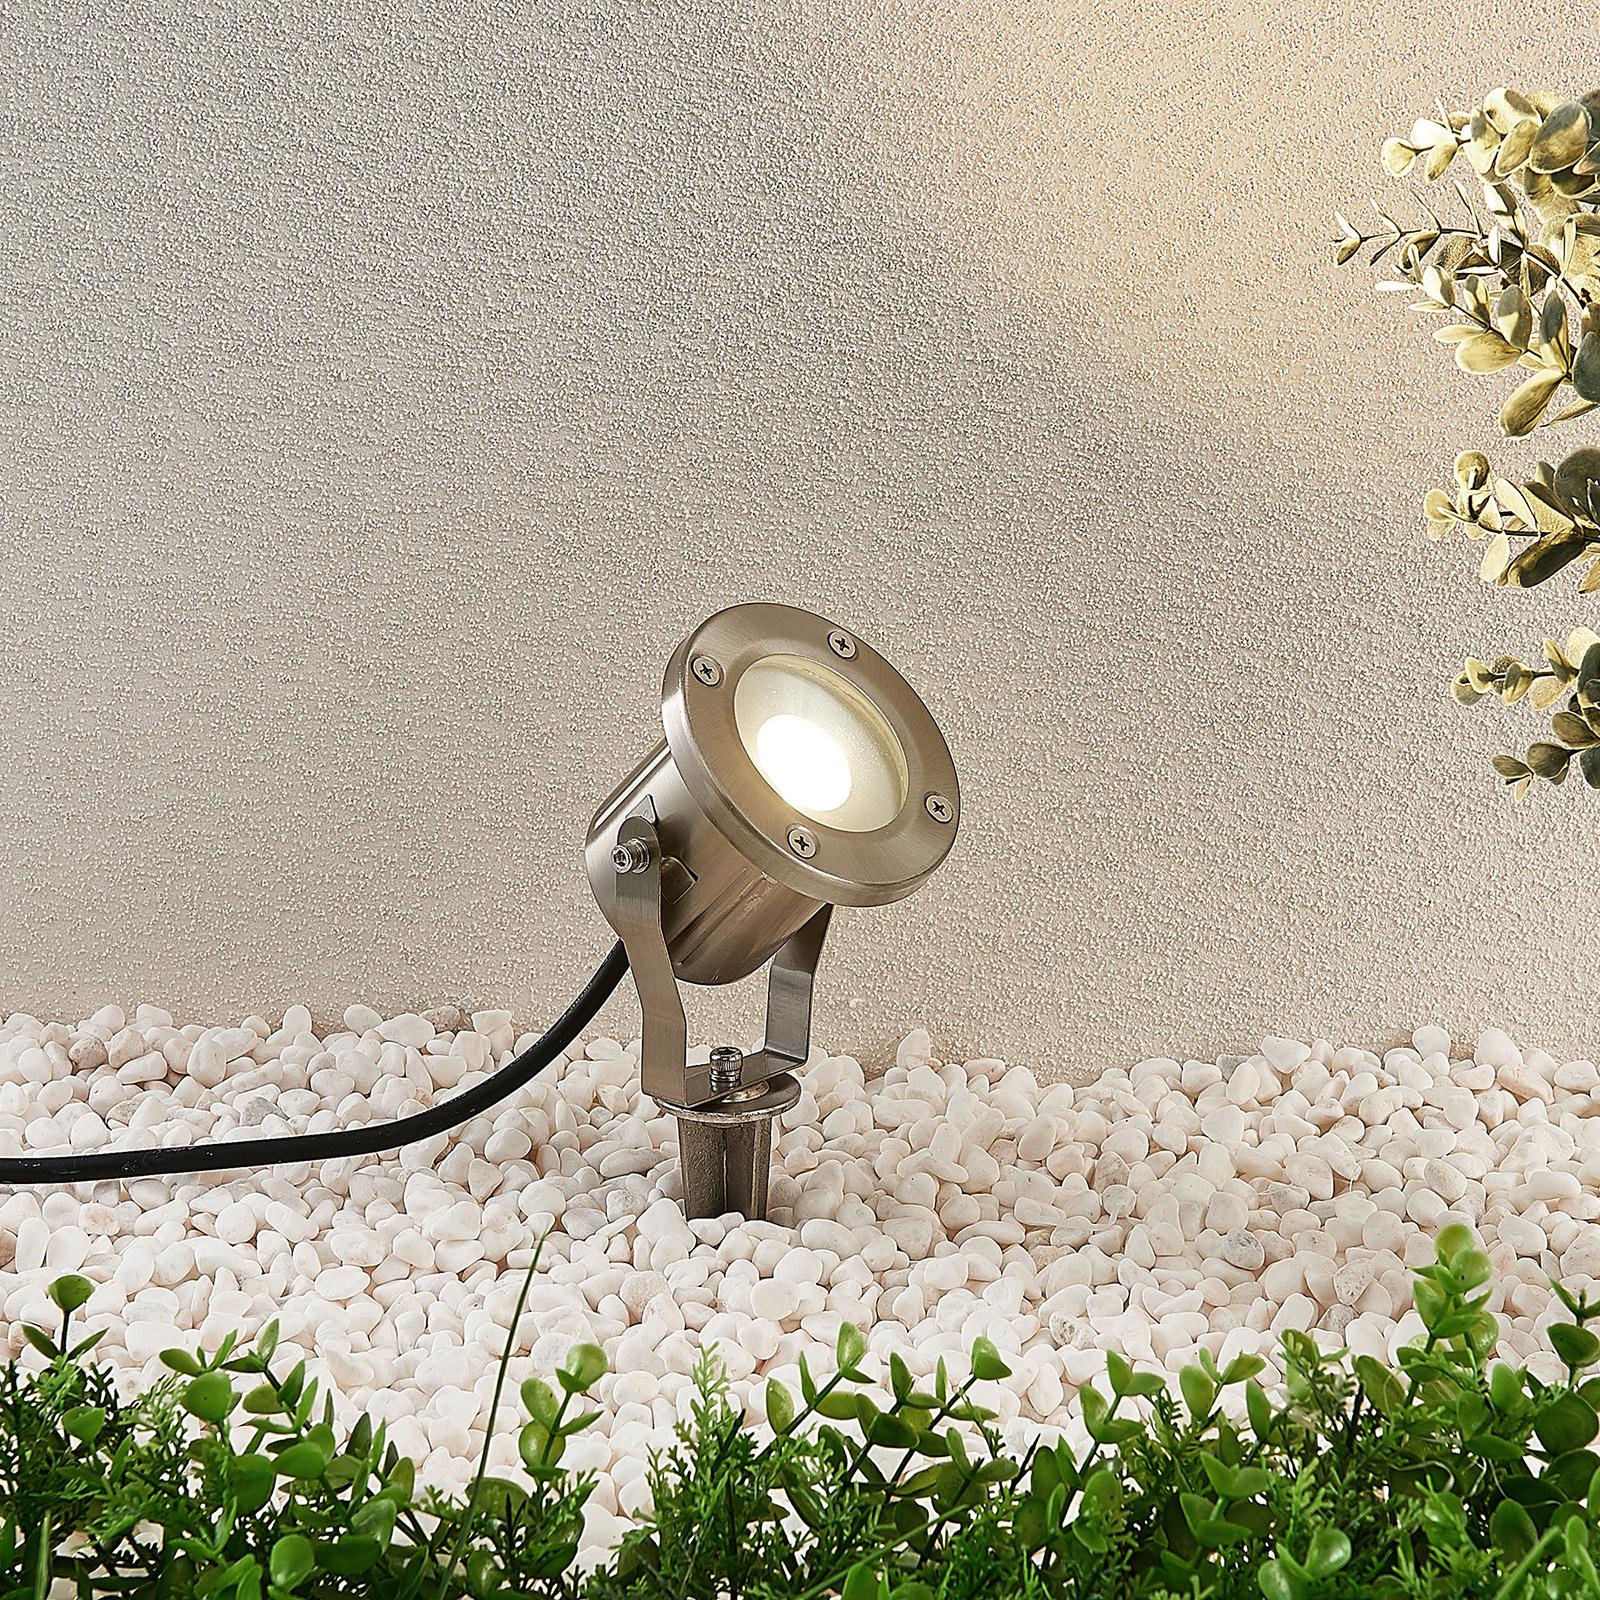 LED-Außenstrahler Mathis, Erdspieß, IP65 Edelstahl